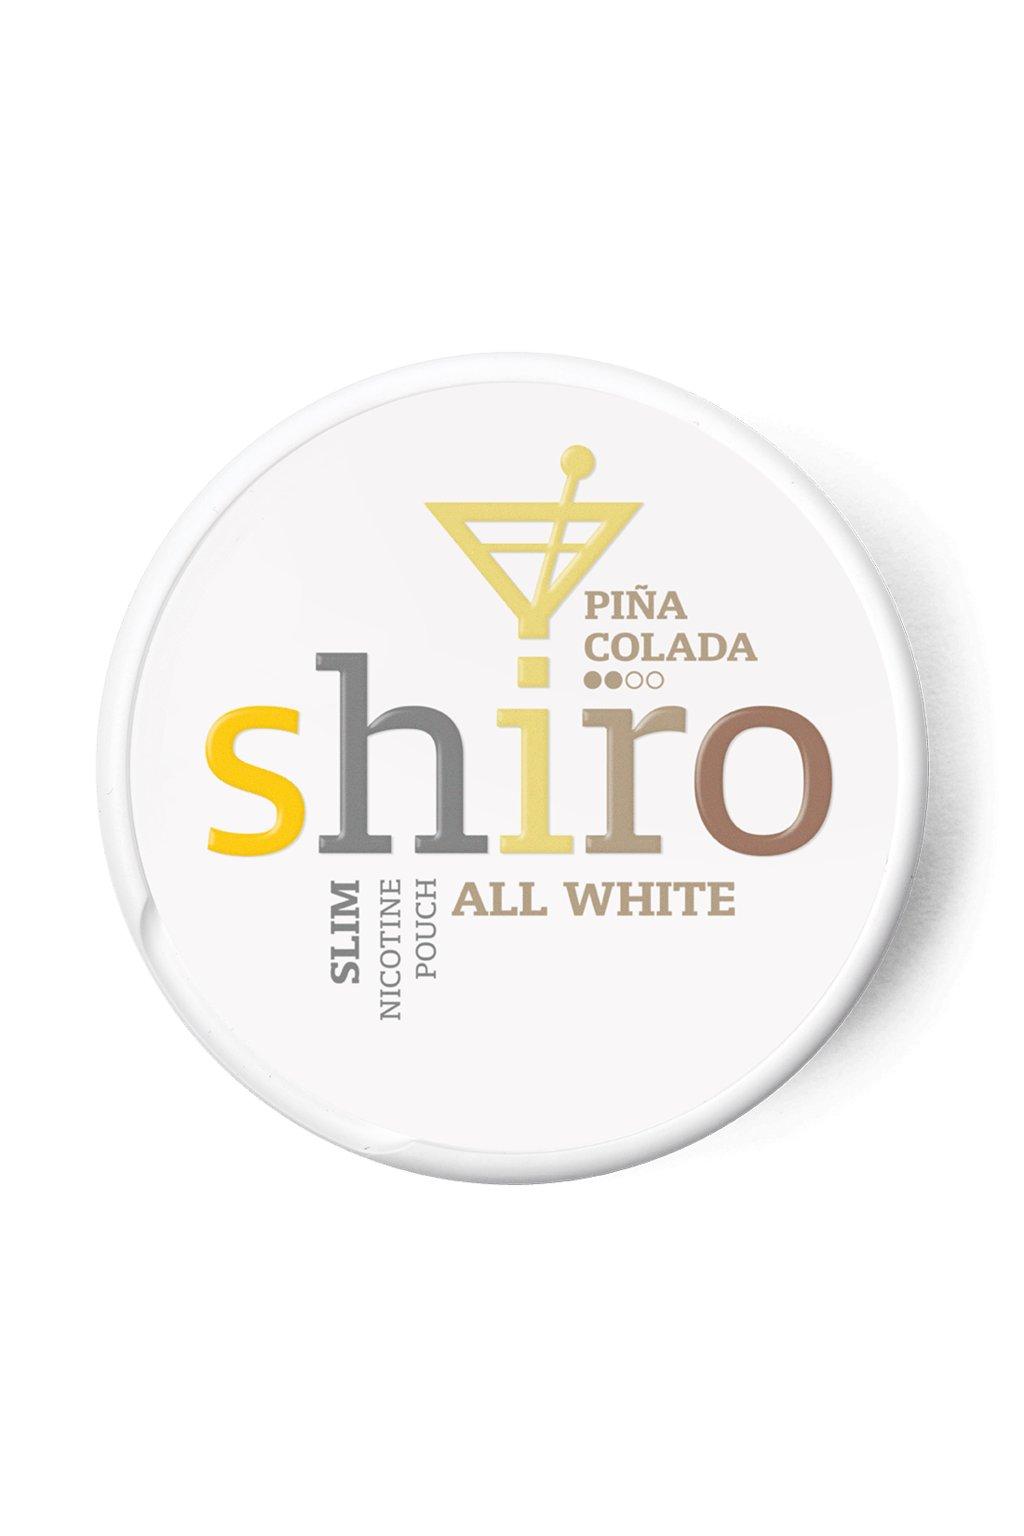 Shiro Pina Colada nikotinove sacky